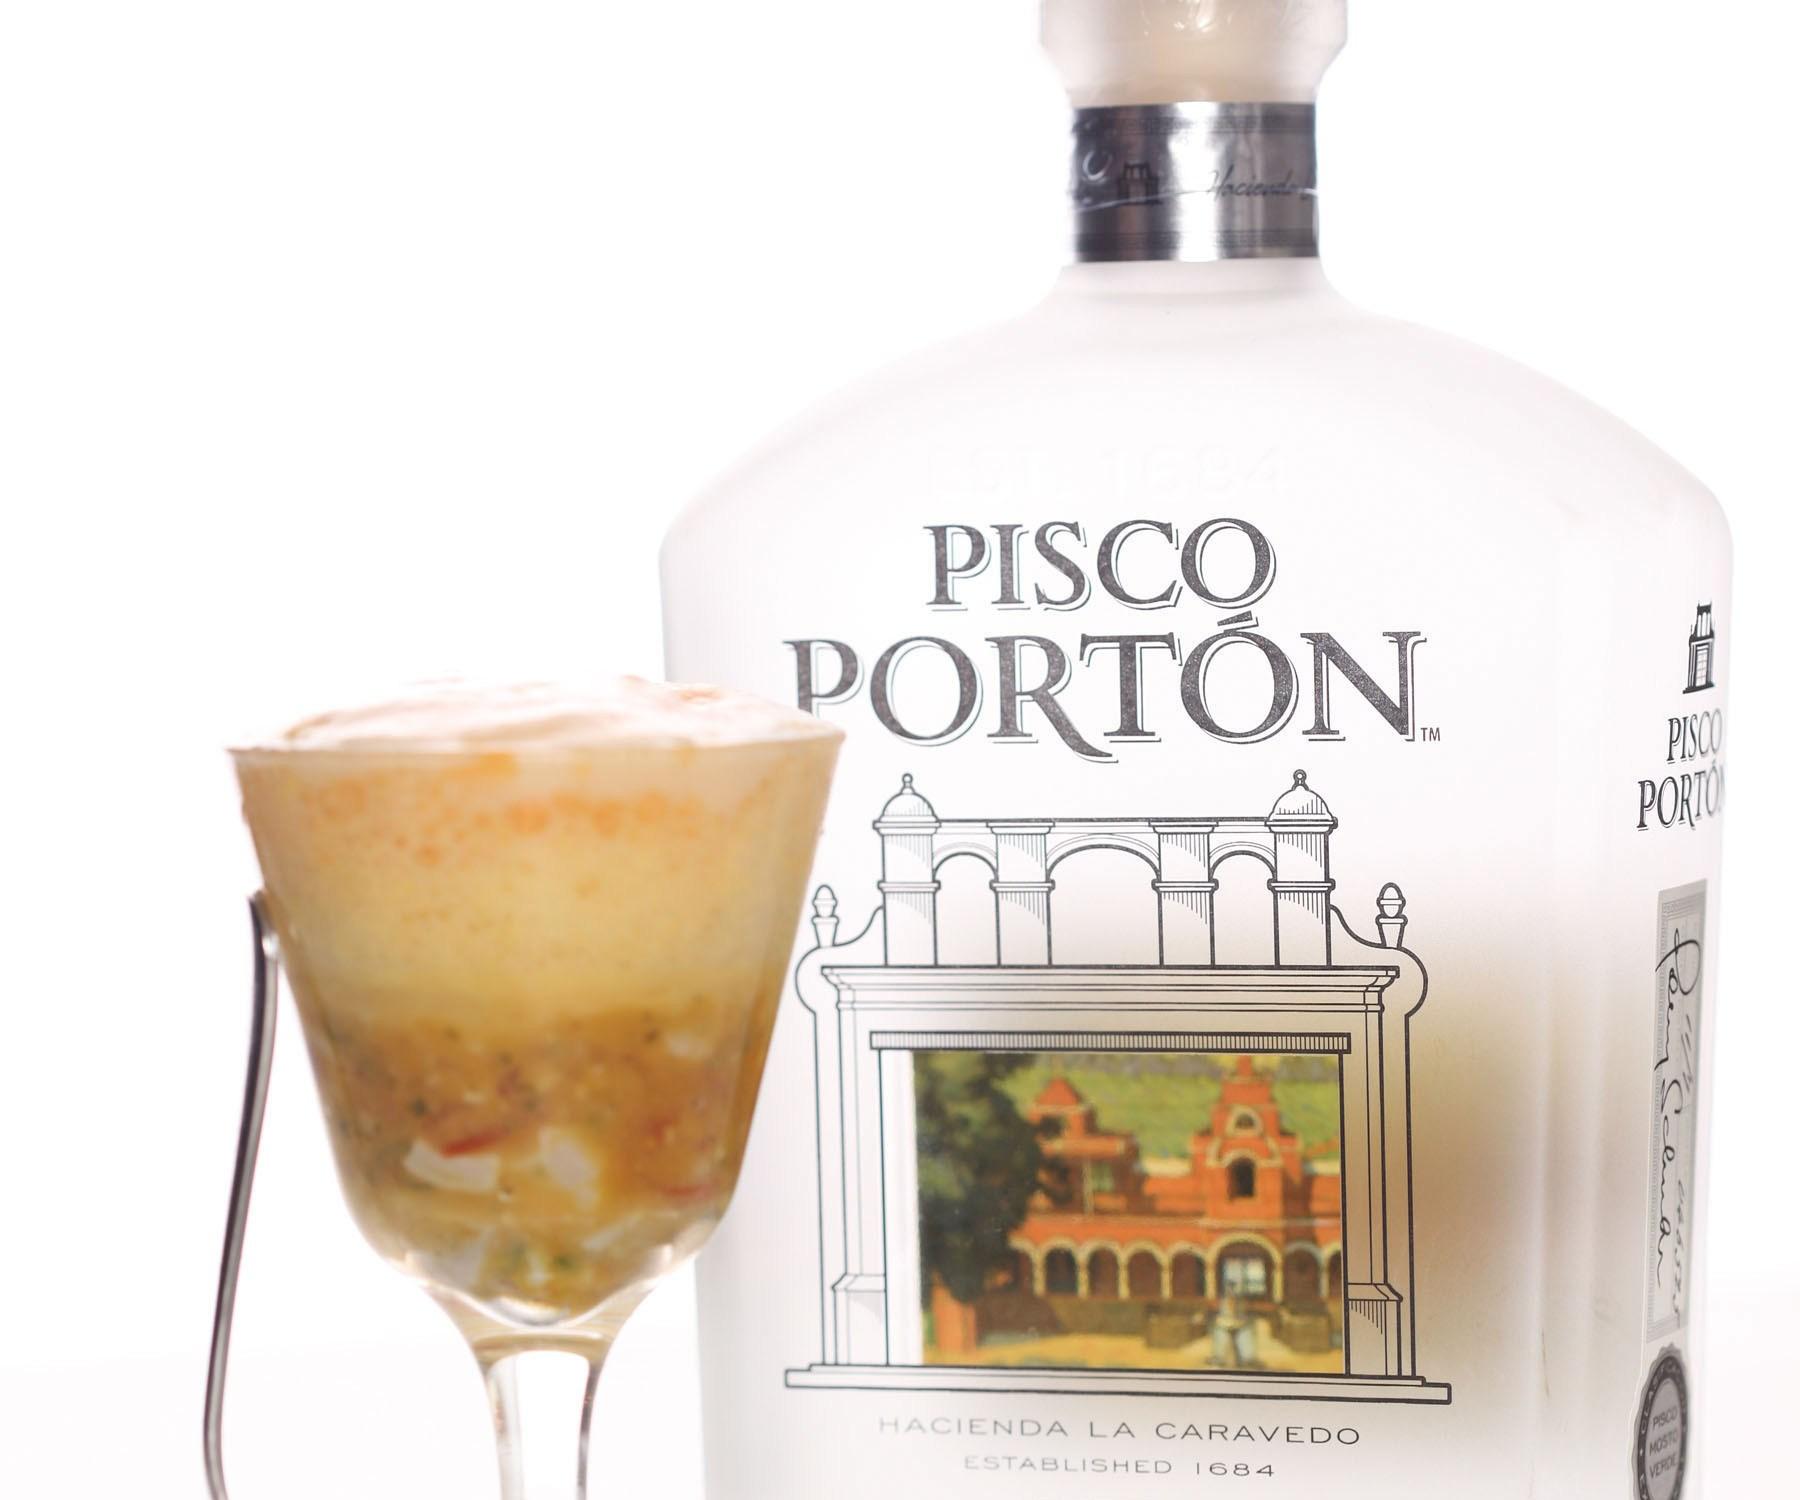 Porton Tigre Cocktail, Handcrafted Perfection You Can Taste. (PRNewsFoto/Porton)